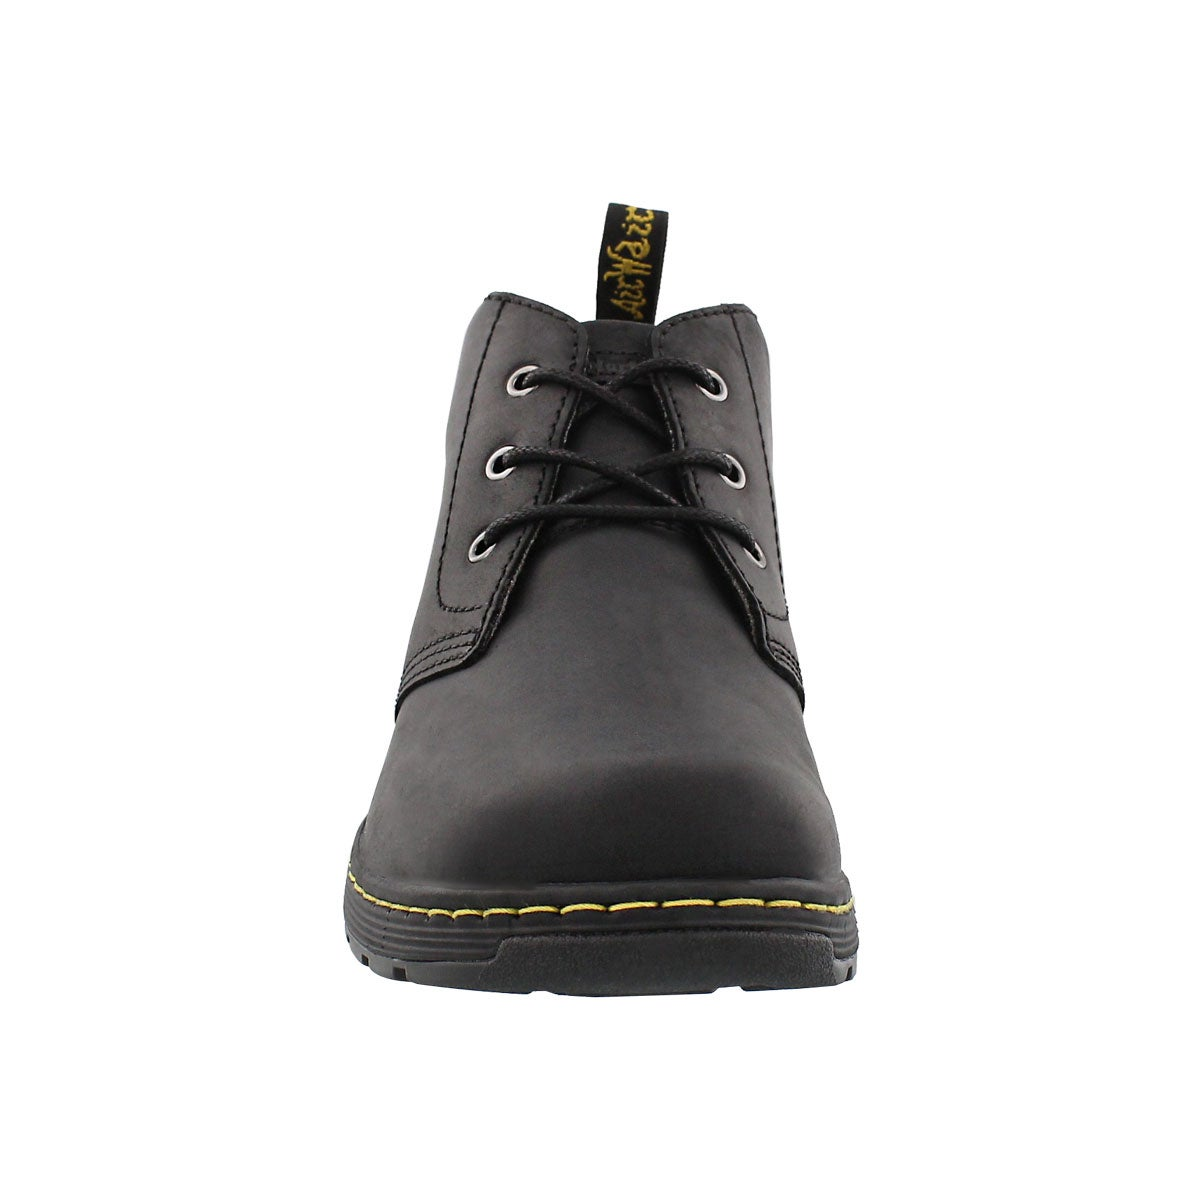 Mns Emil black oily lthr chukka boot